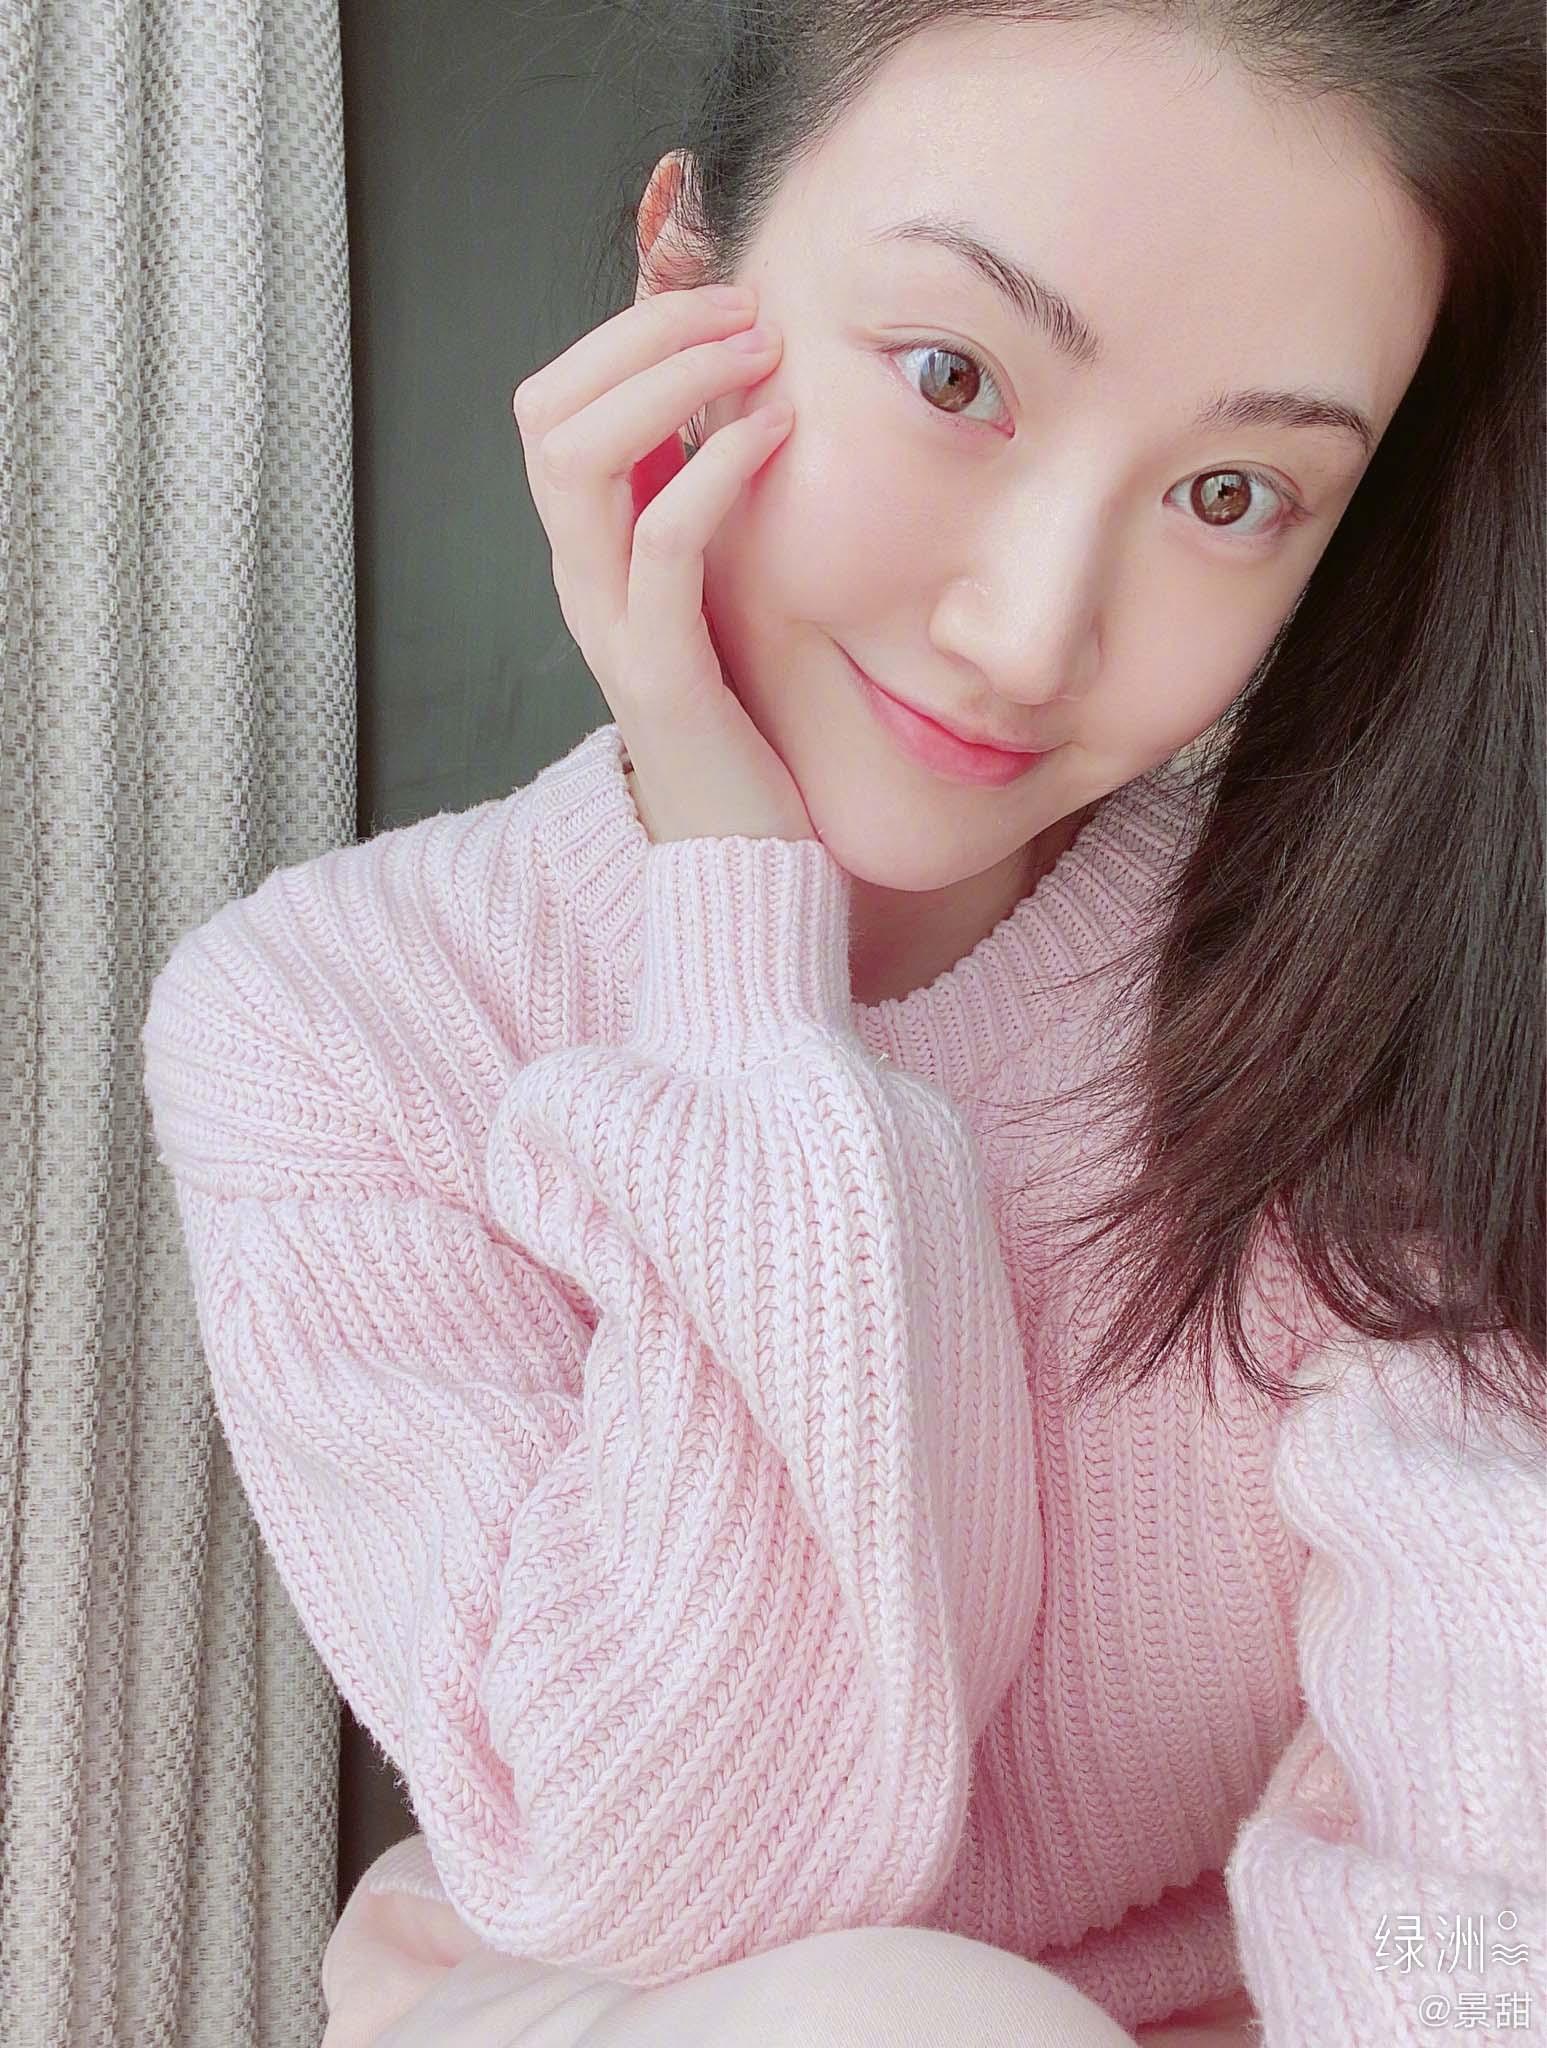 , Jing Tian shares new year greetings